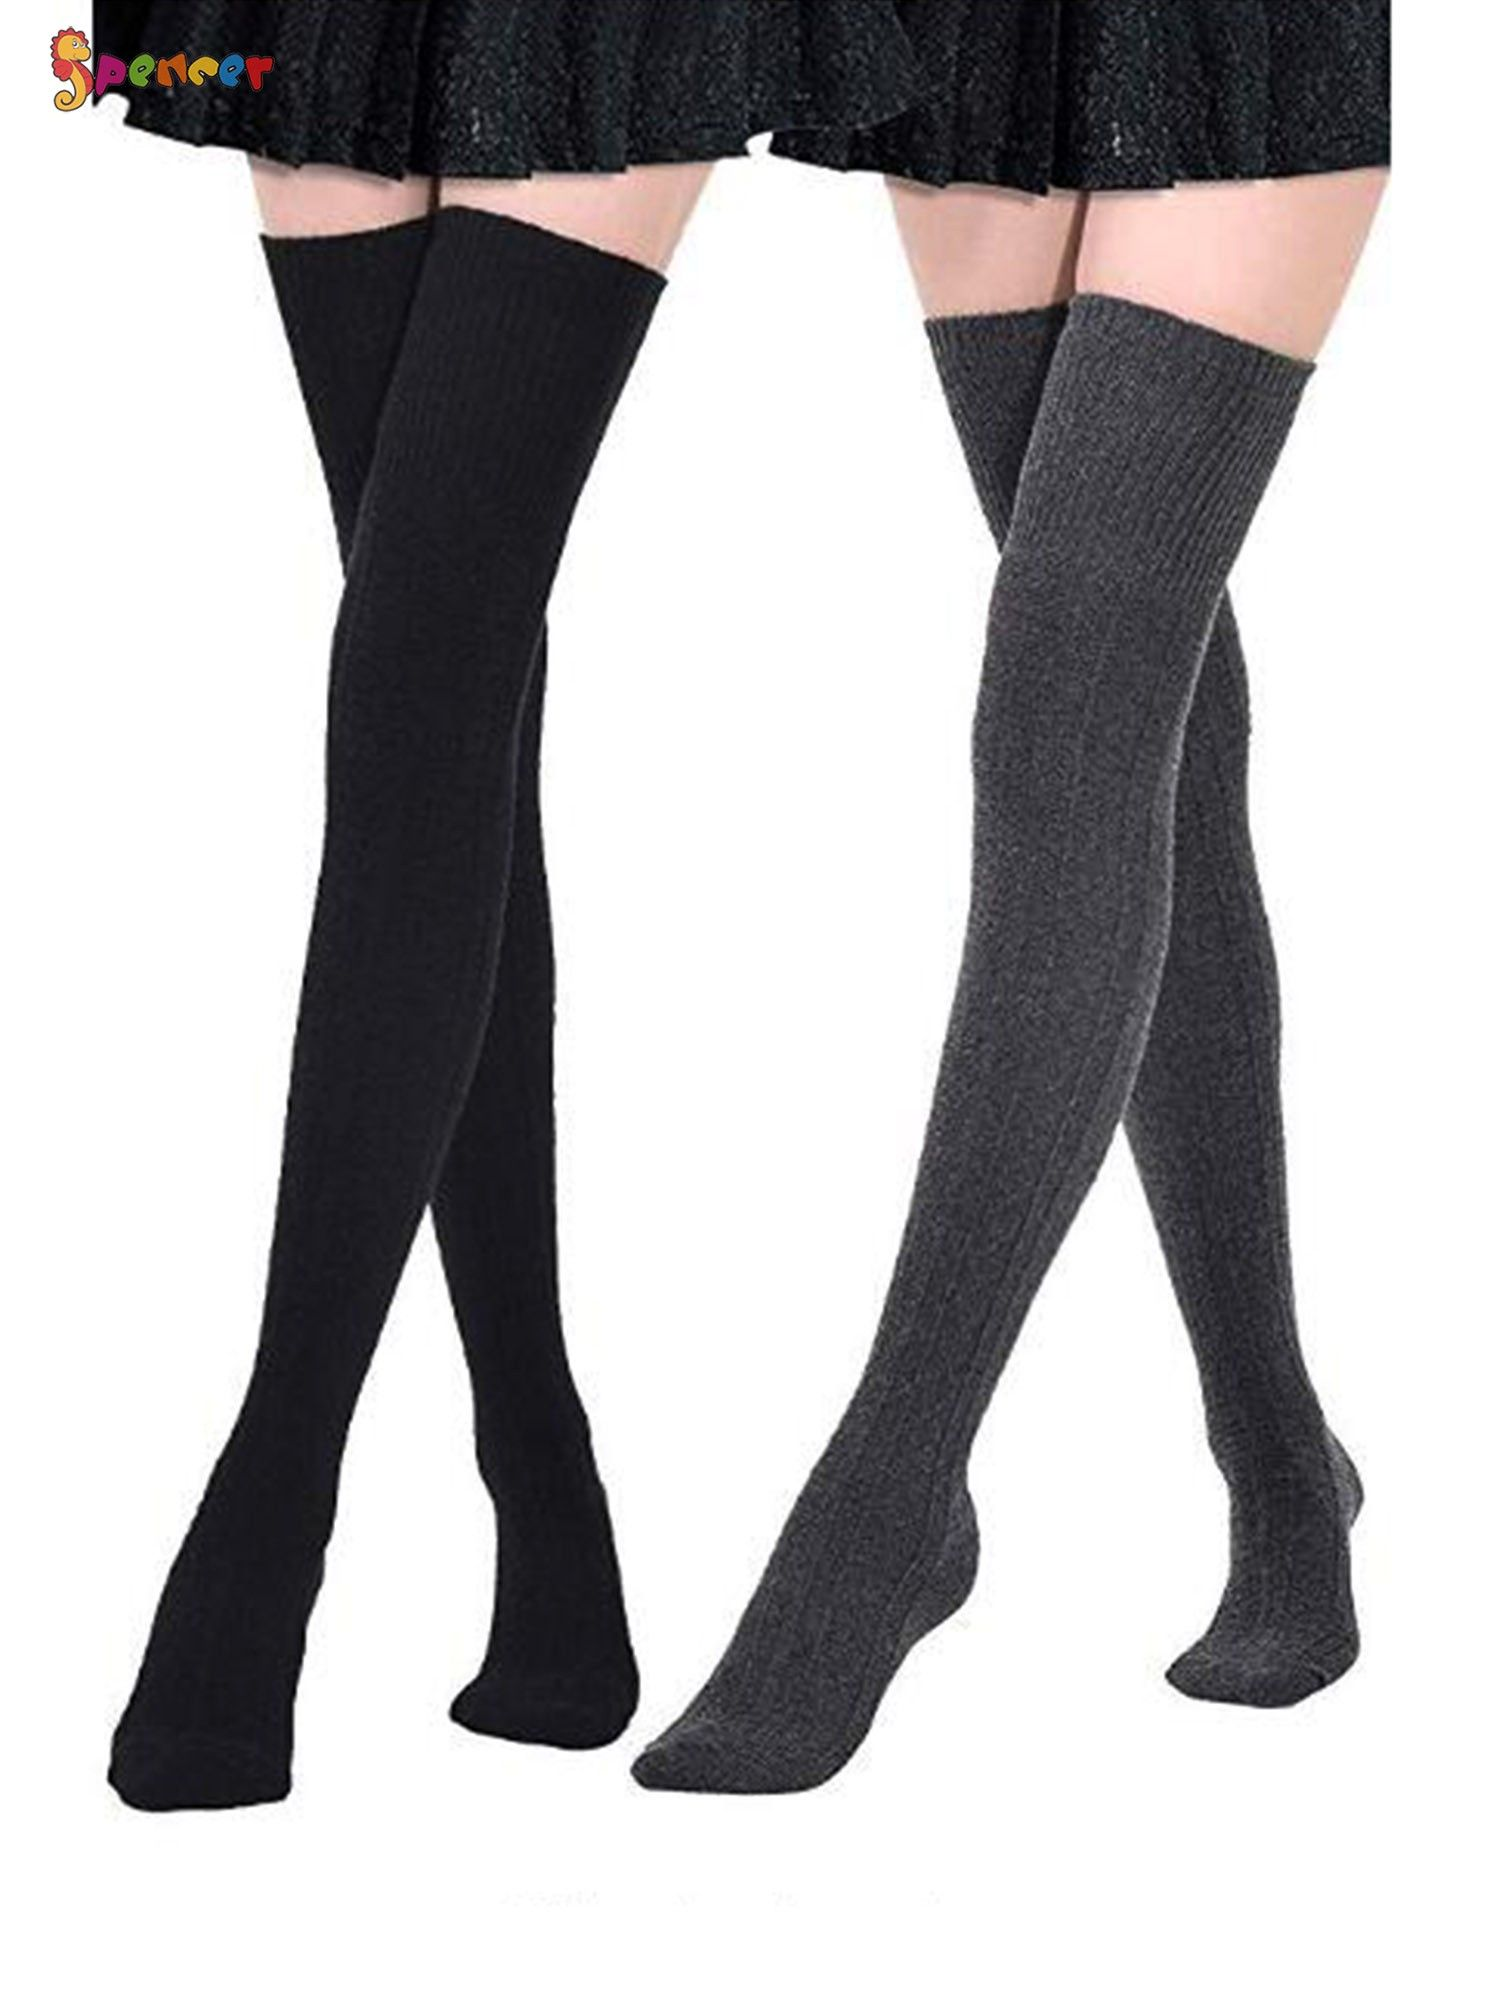 Women Knee High Cotton Boot Socks Vintage Back To School Alphabet ABC Tall Boots Long Sock